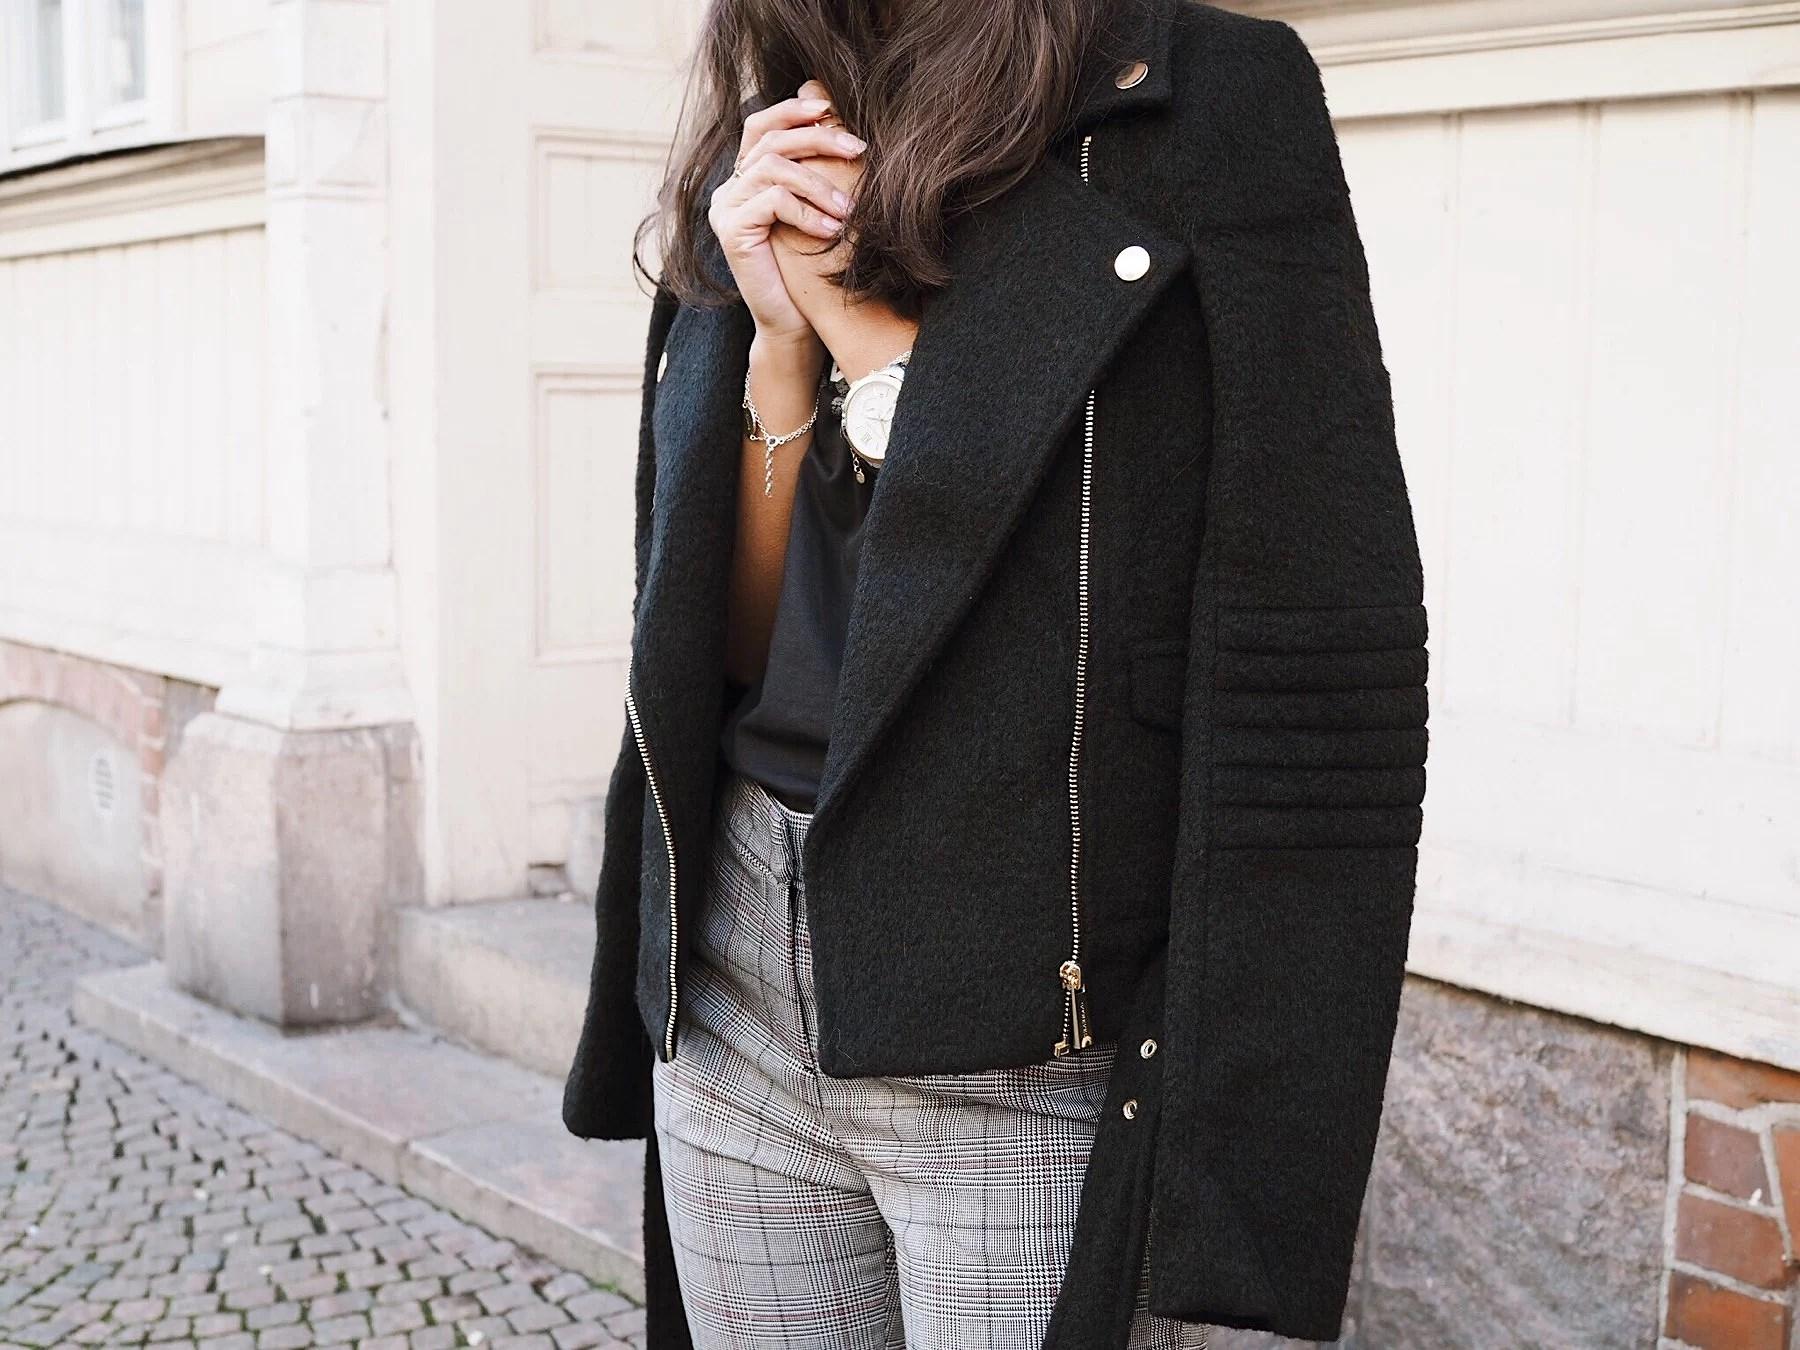 Outfit sneakpeak...